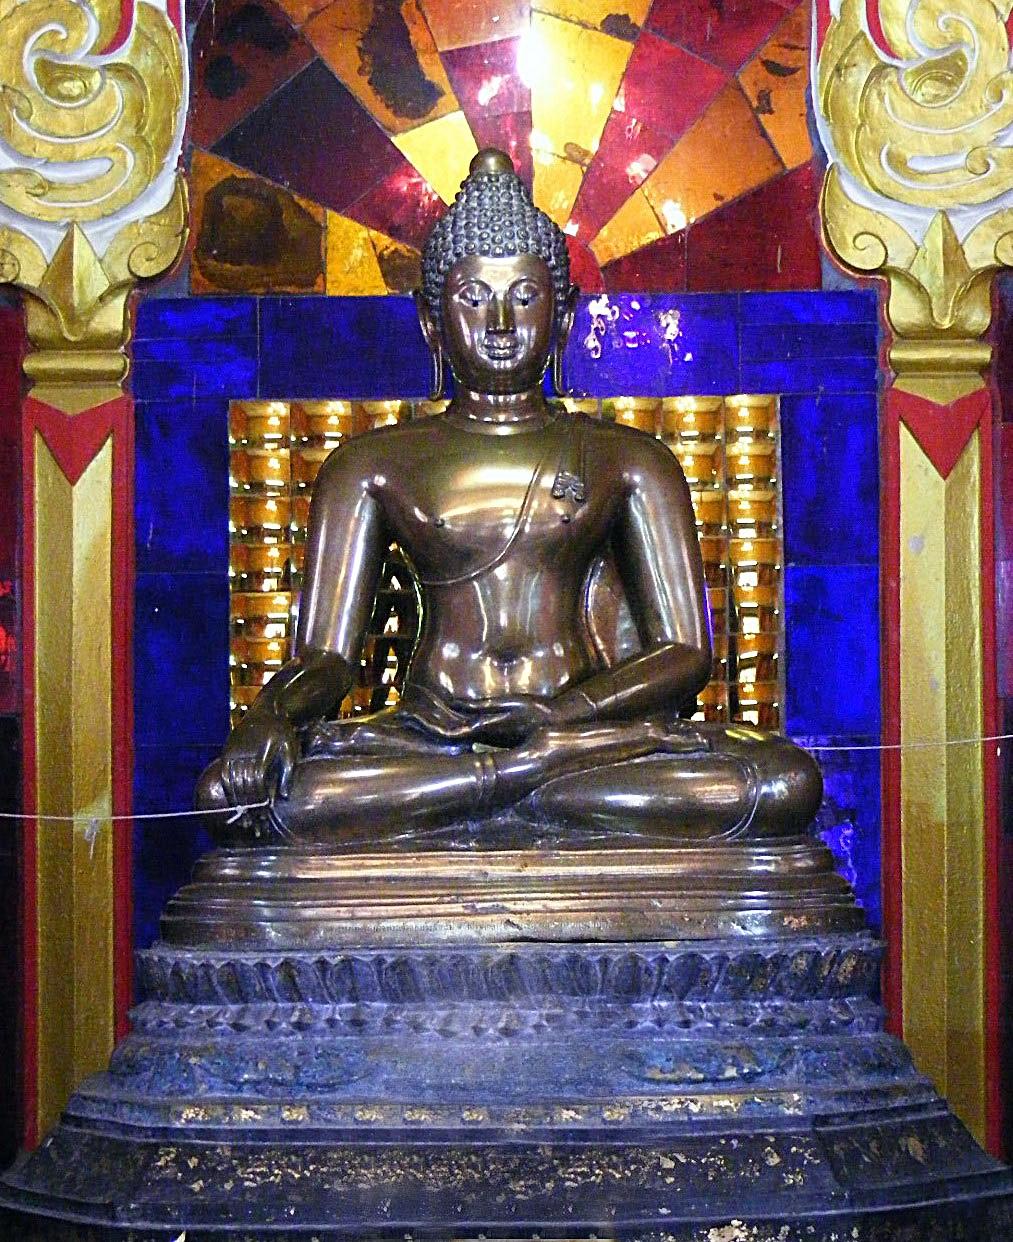 http://upload.wikimedia.org/wikipedia/commons/7/73/Luang_Pho_Phet_%28Wat_Tha_Thanon%29.jpg